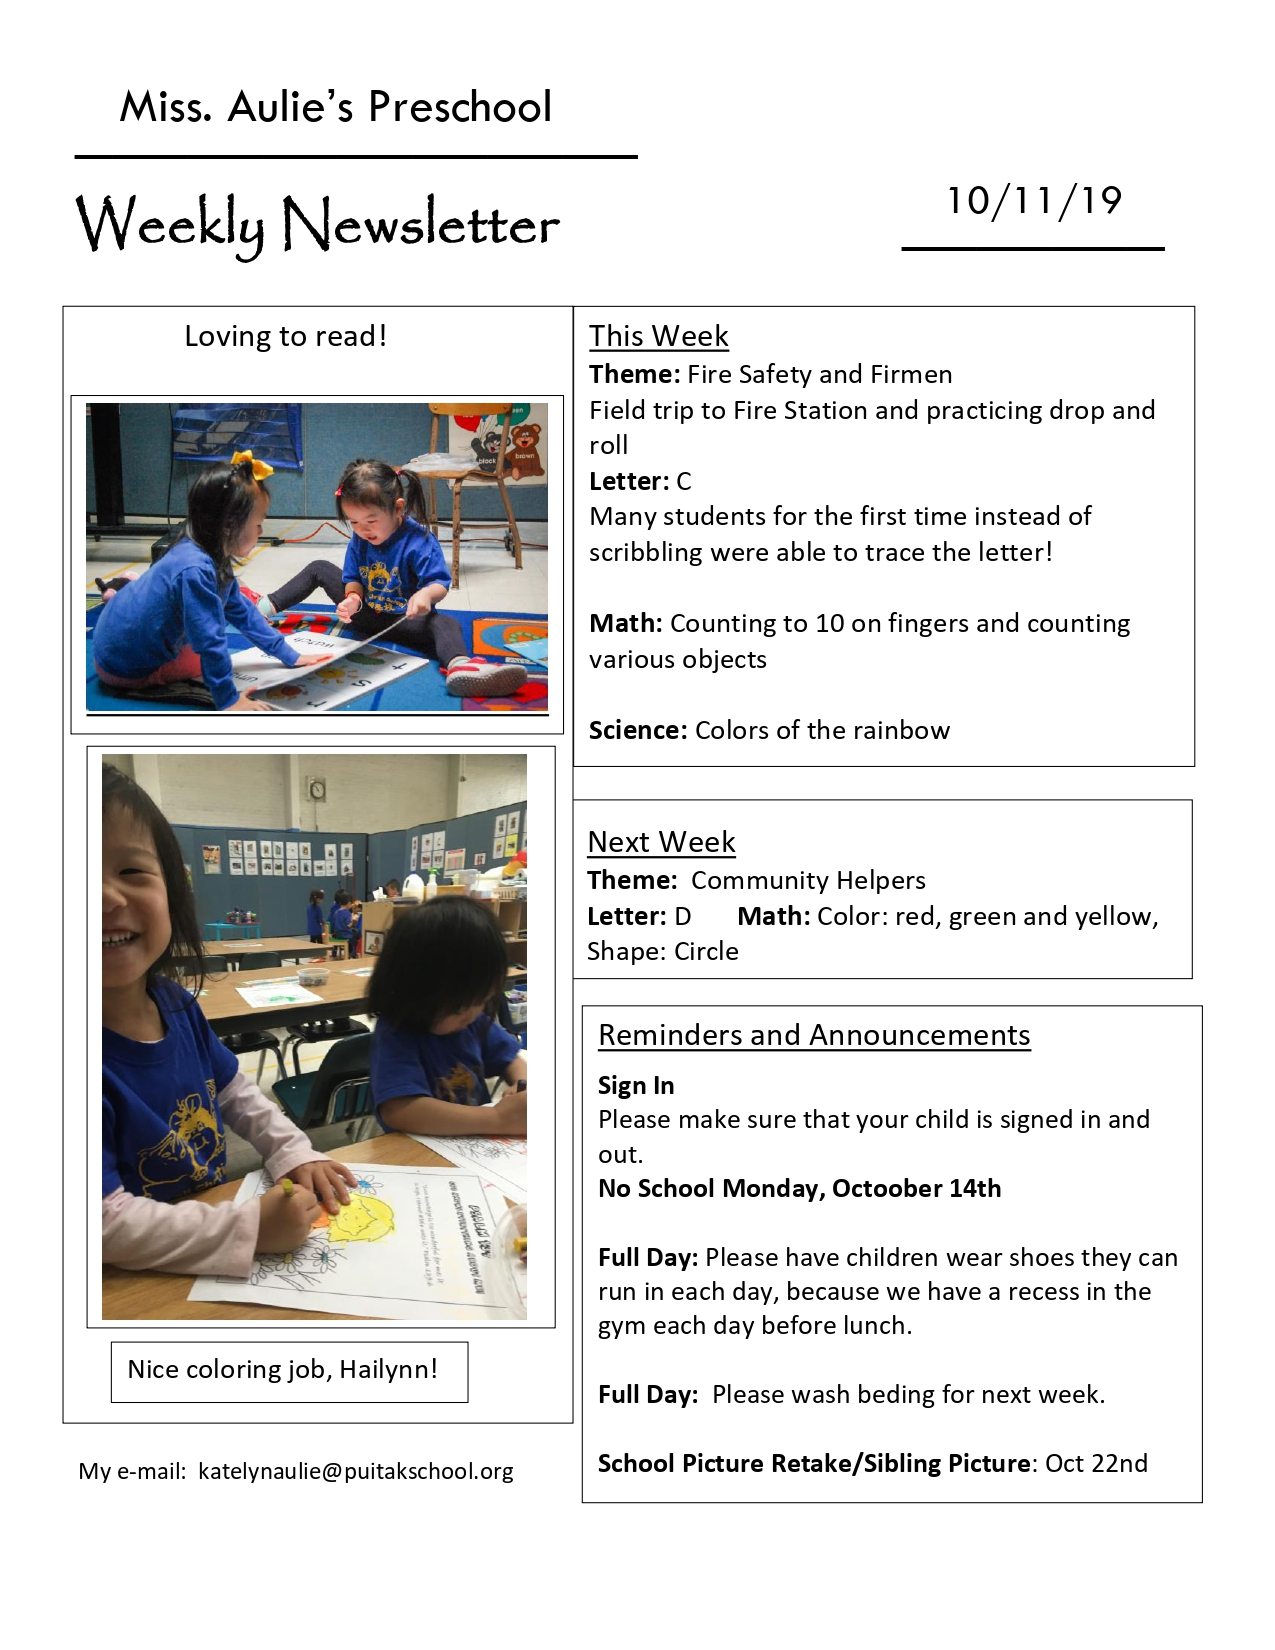 KatelynNewletter2019October2ndweek_page-